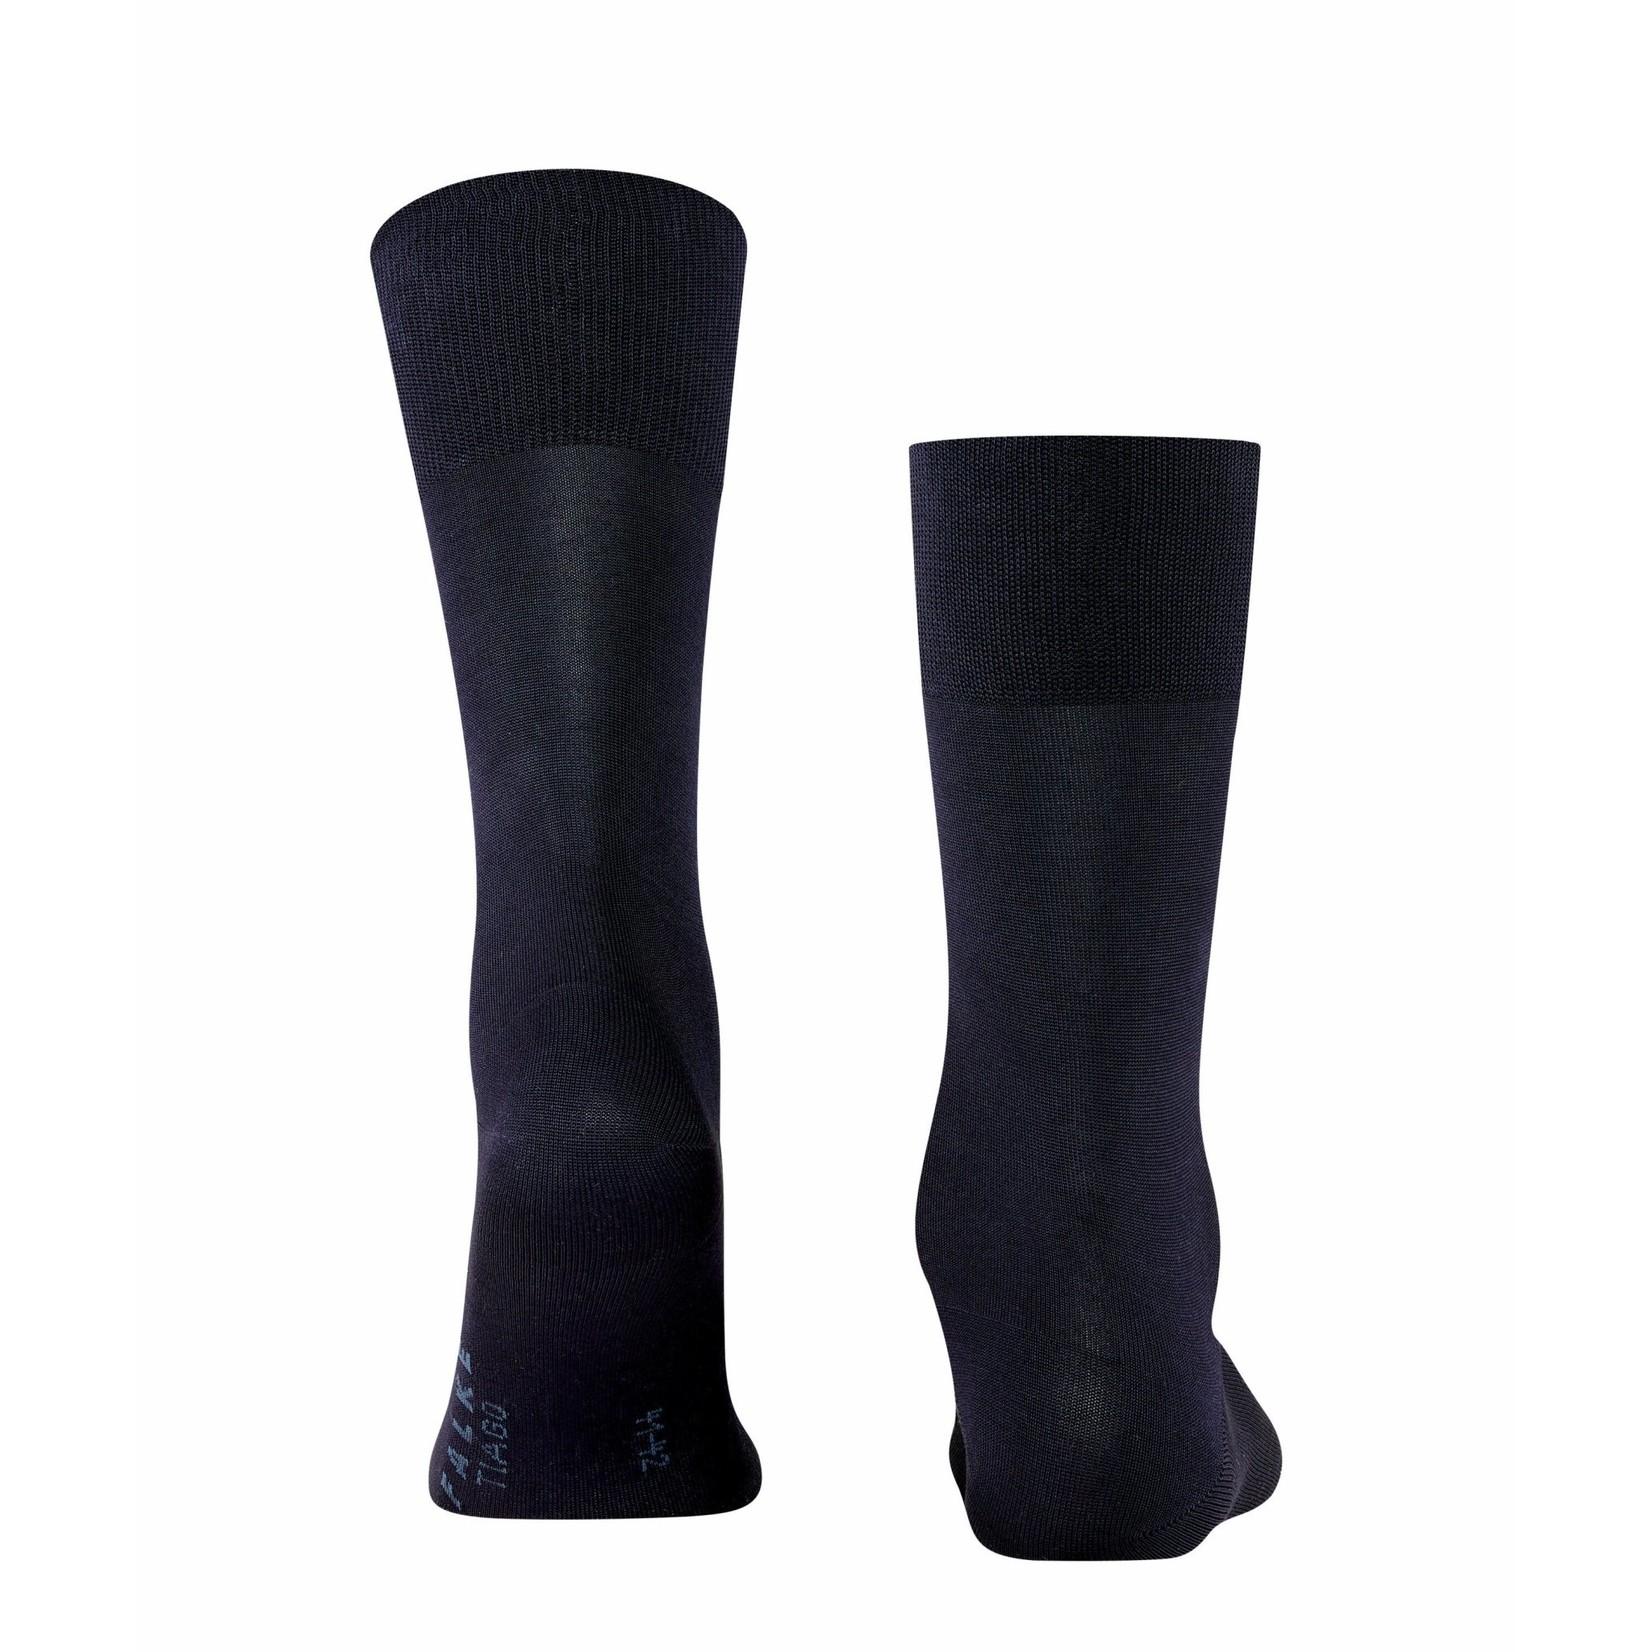 Falke Tiago sokken donker marine